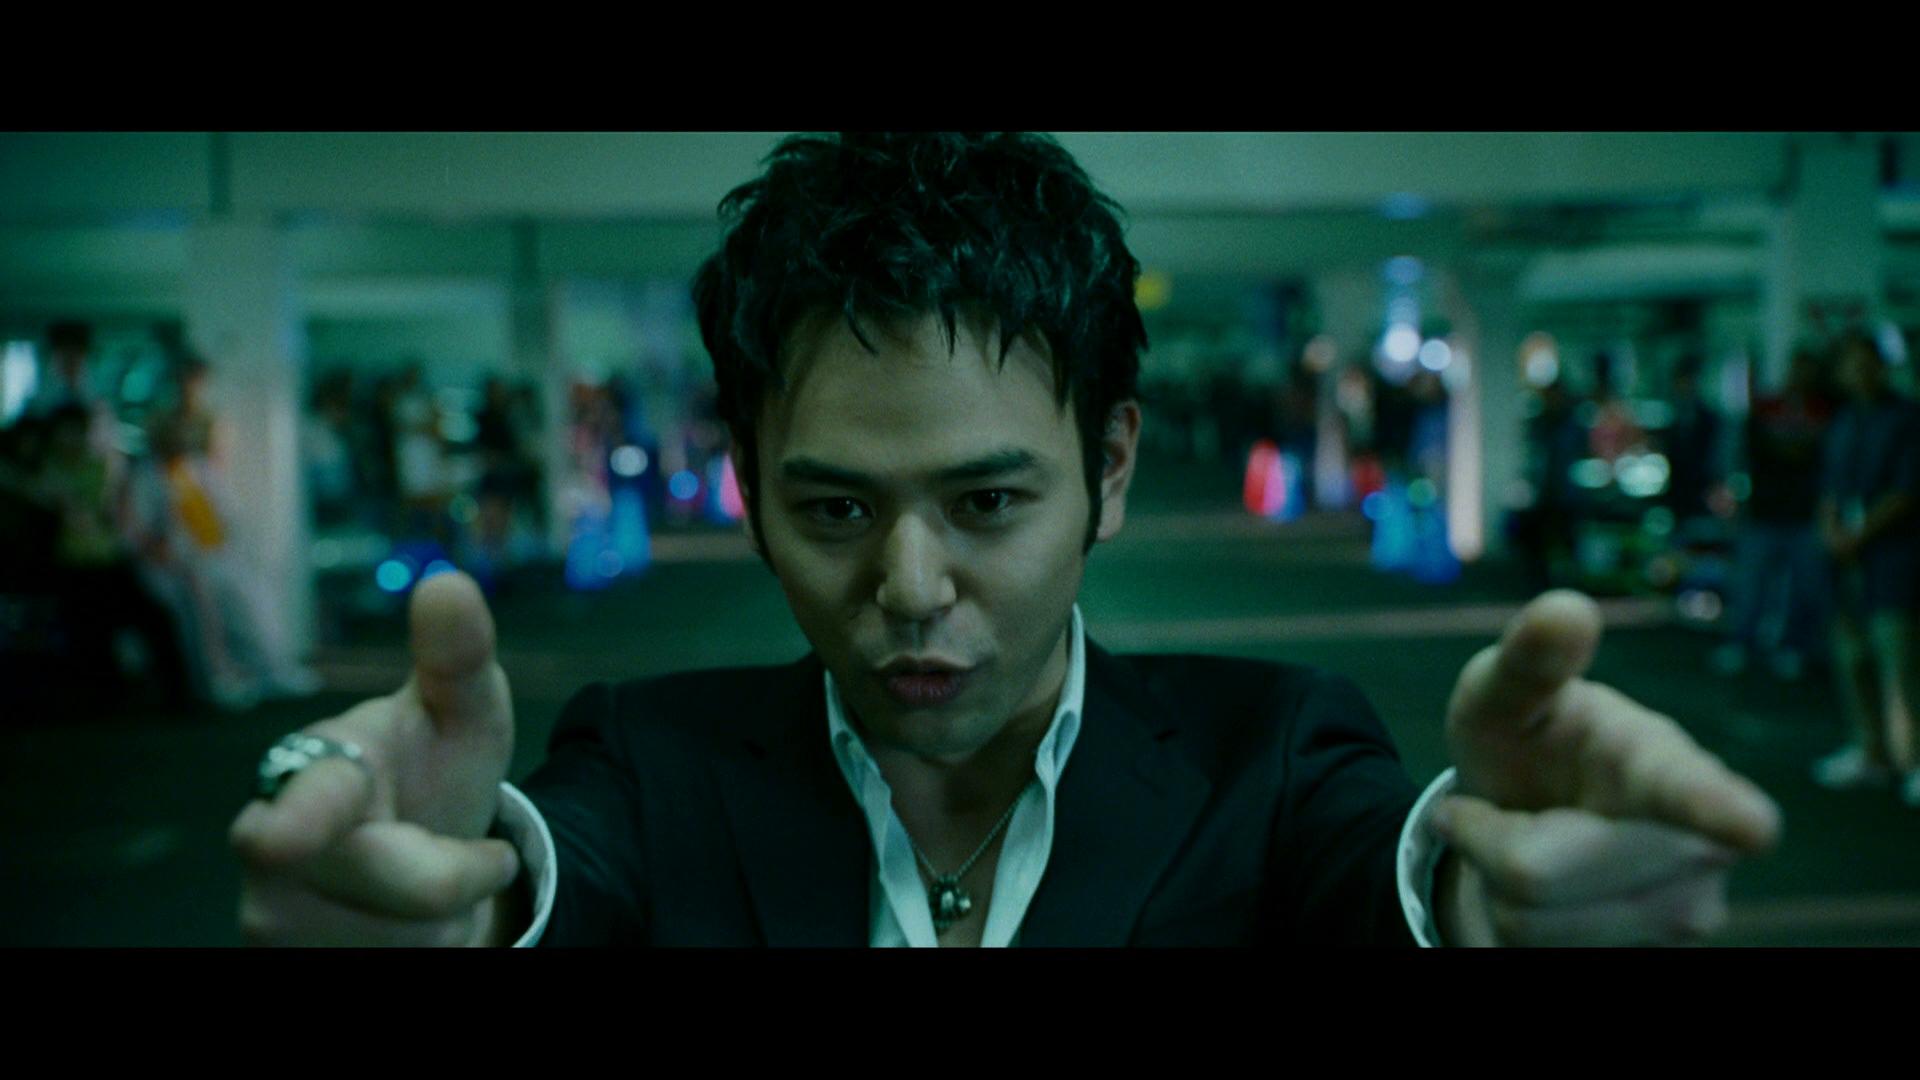 DOLOMITEN 2014 - Pagina 3 Fast_and_the_furious_tokyo_drift_satoshi_tsumabuki_ready_set_go